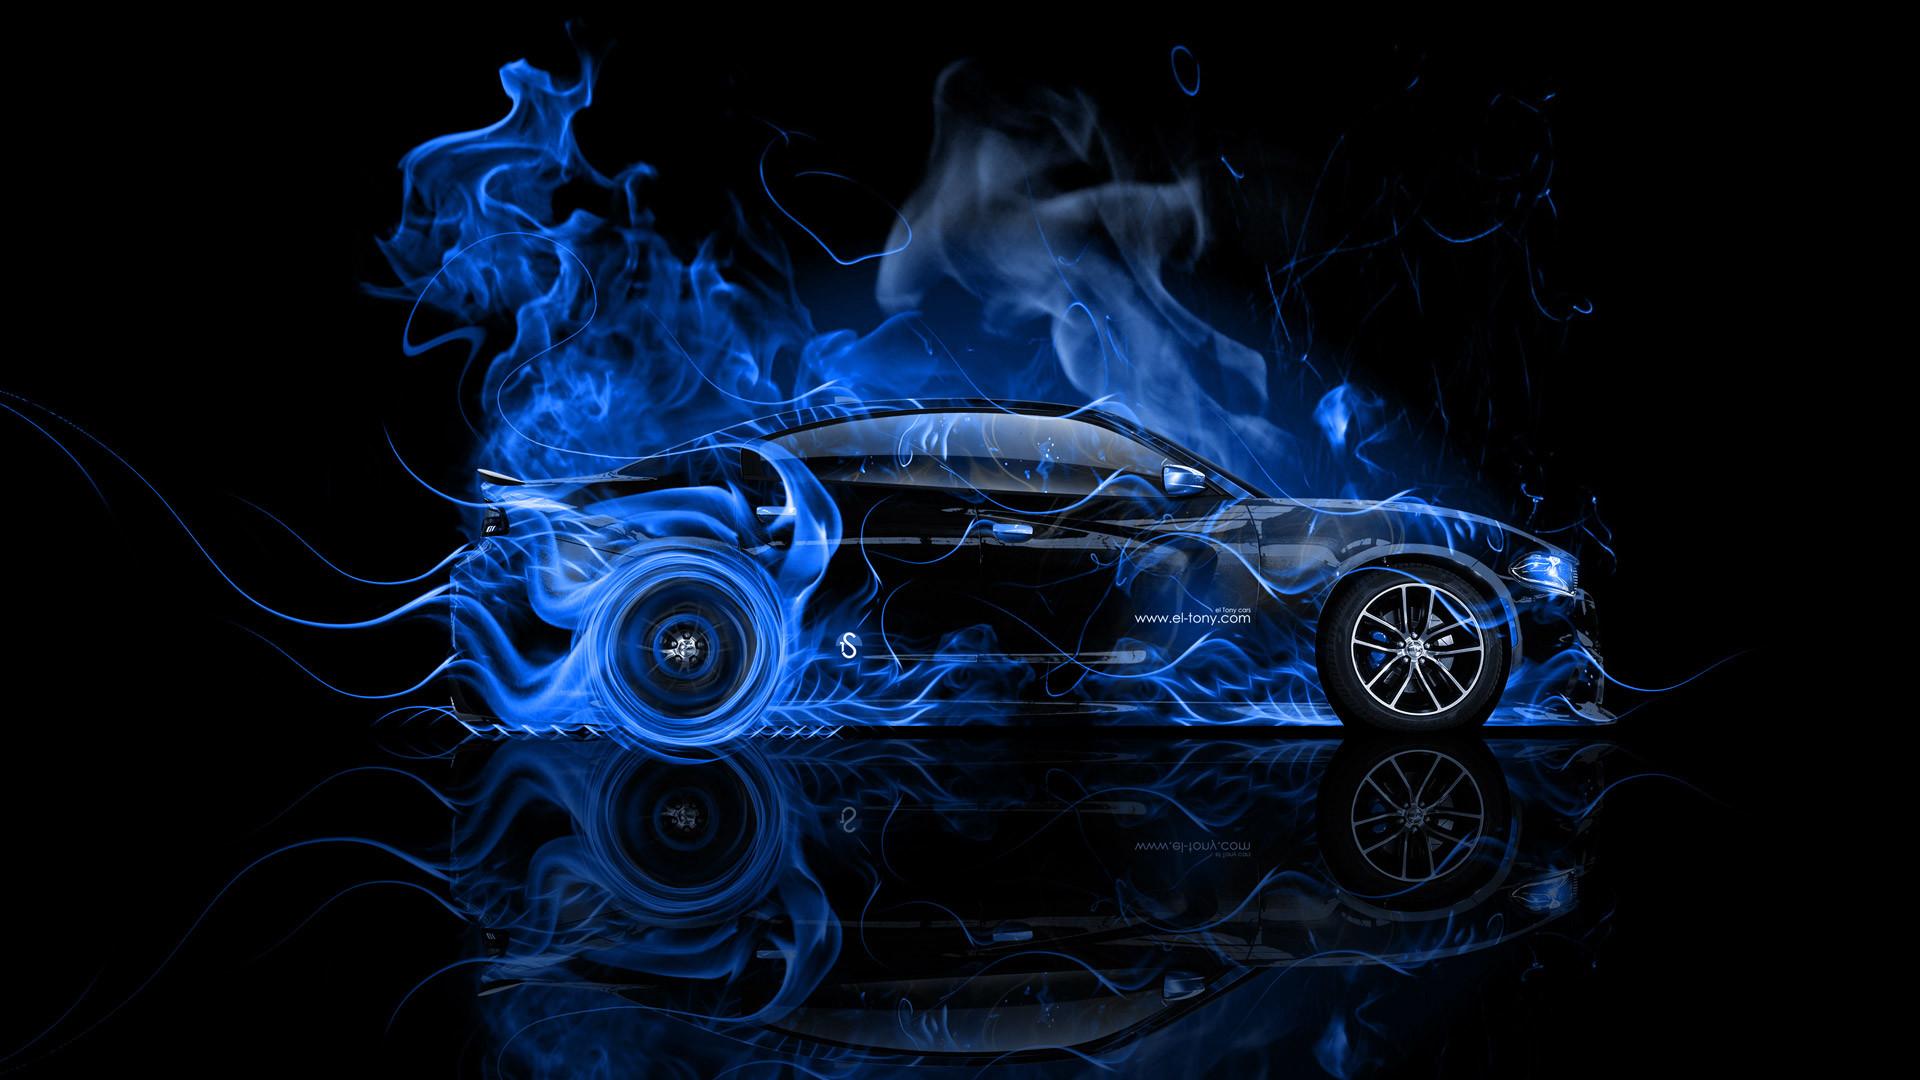 Lexus LF LC Blue Fire Abstract Car 2013